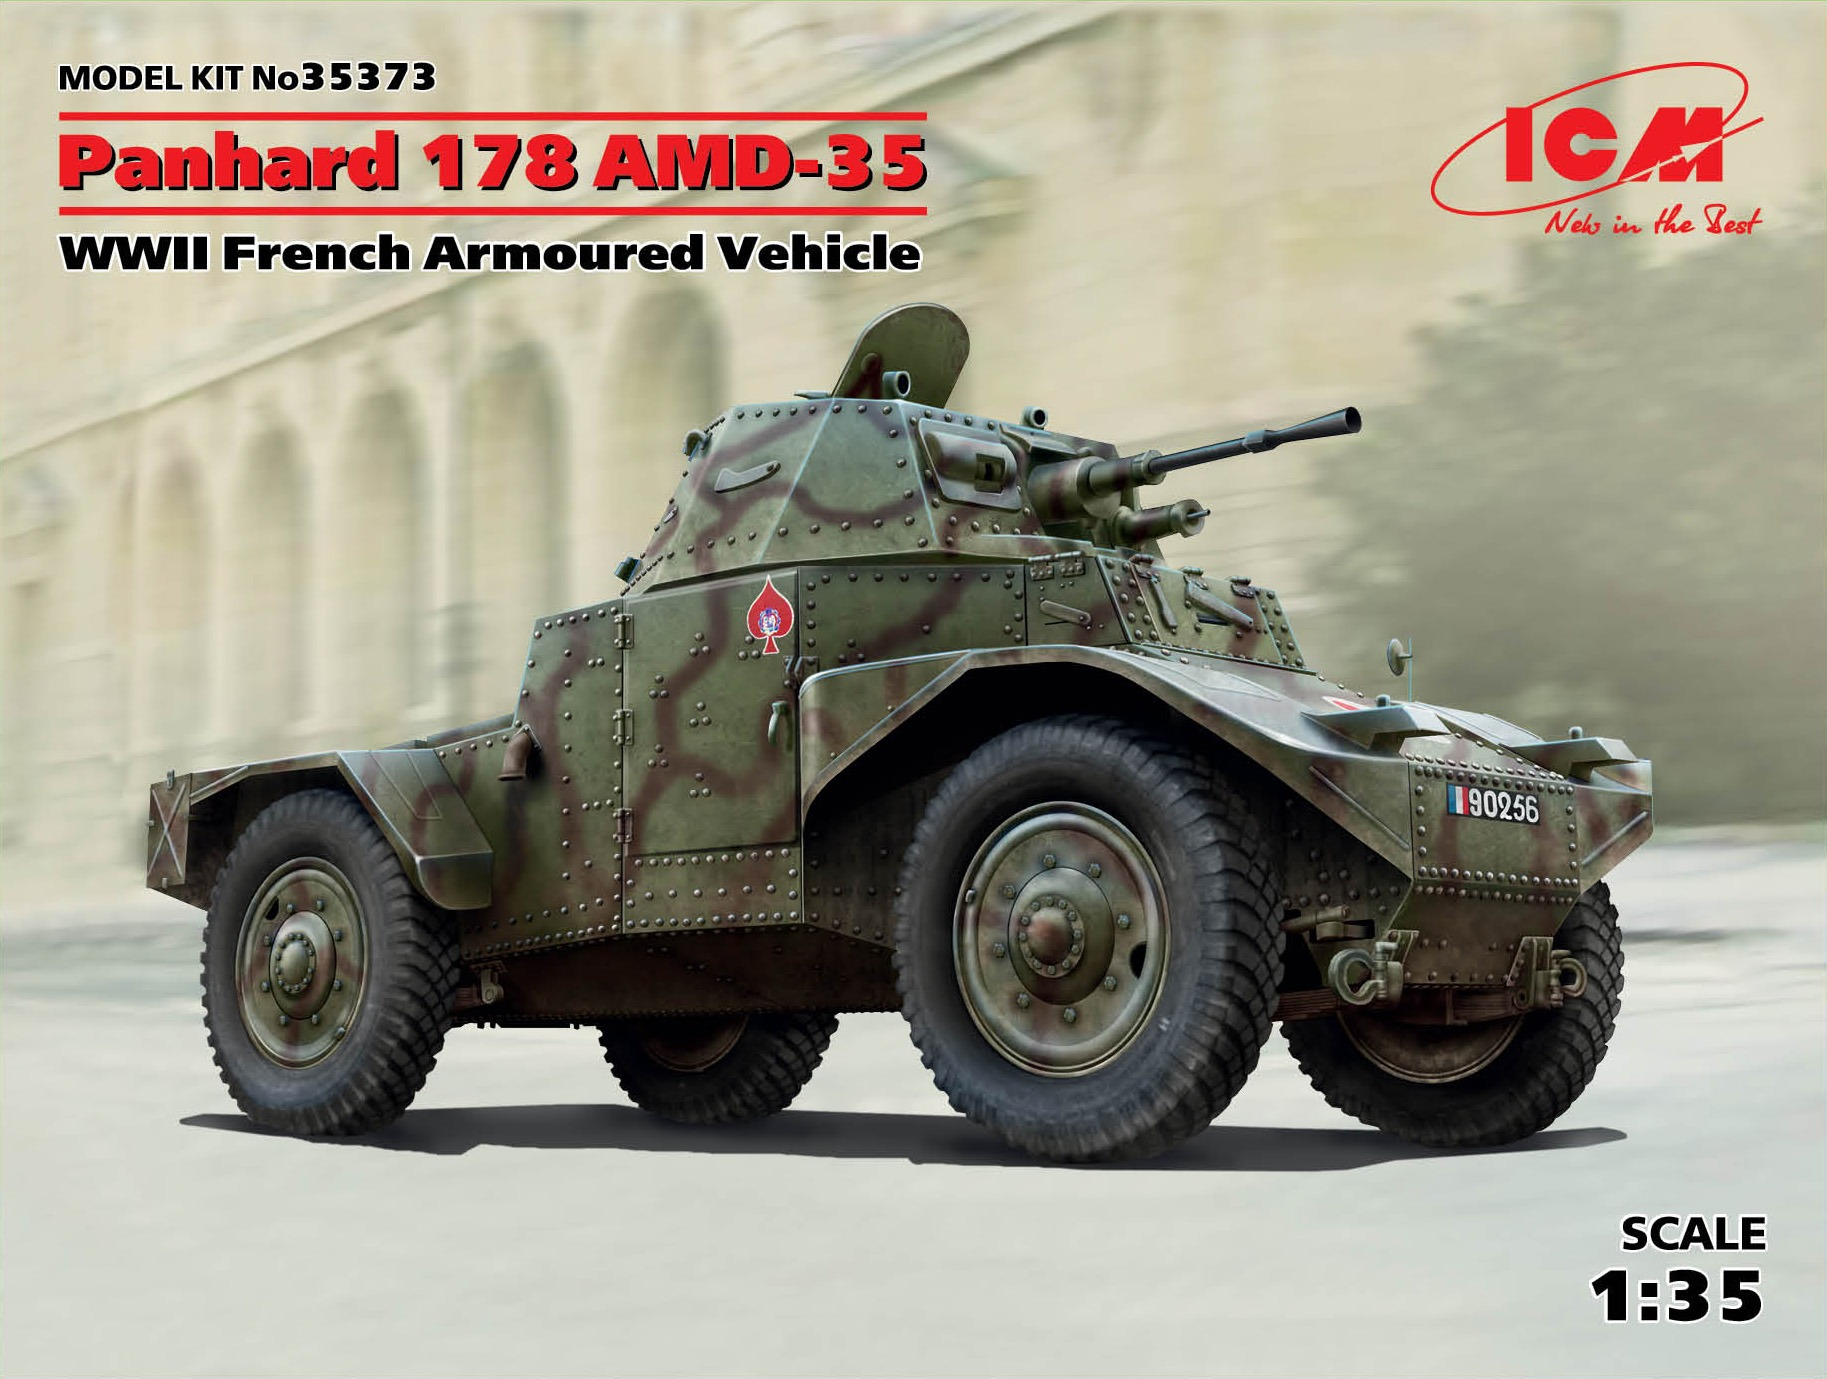 ICM 1/35 Panhard 178 AMD-35, WWII French Armoured Vehicle